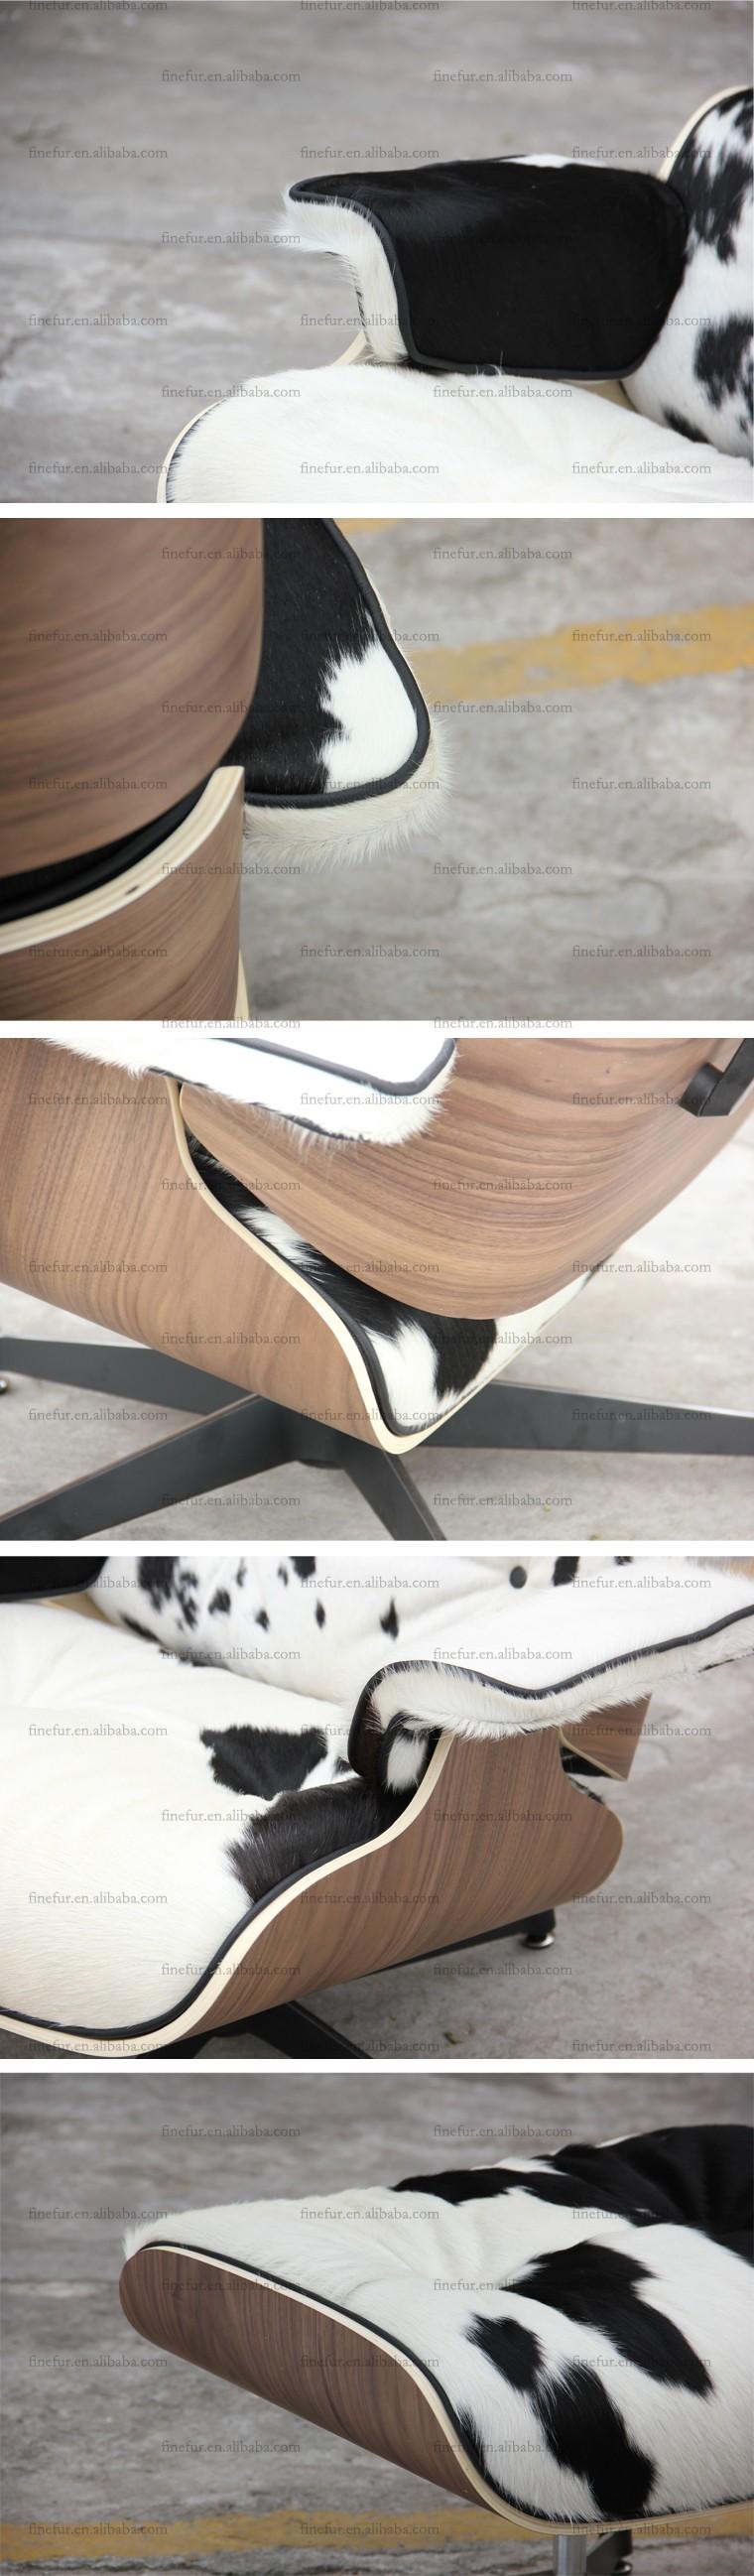 Koe verbergen cover klassieke meubels slaapkamer ontwerp relax ...